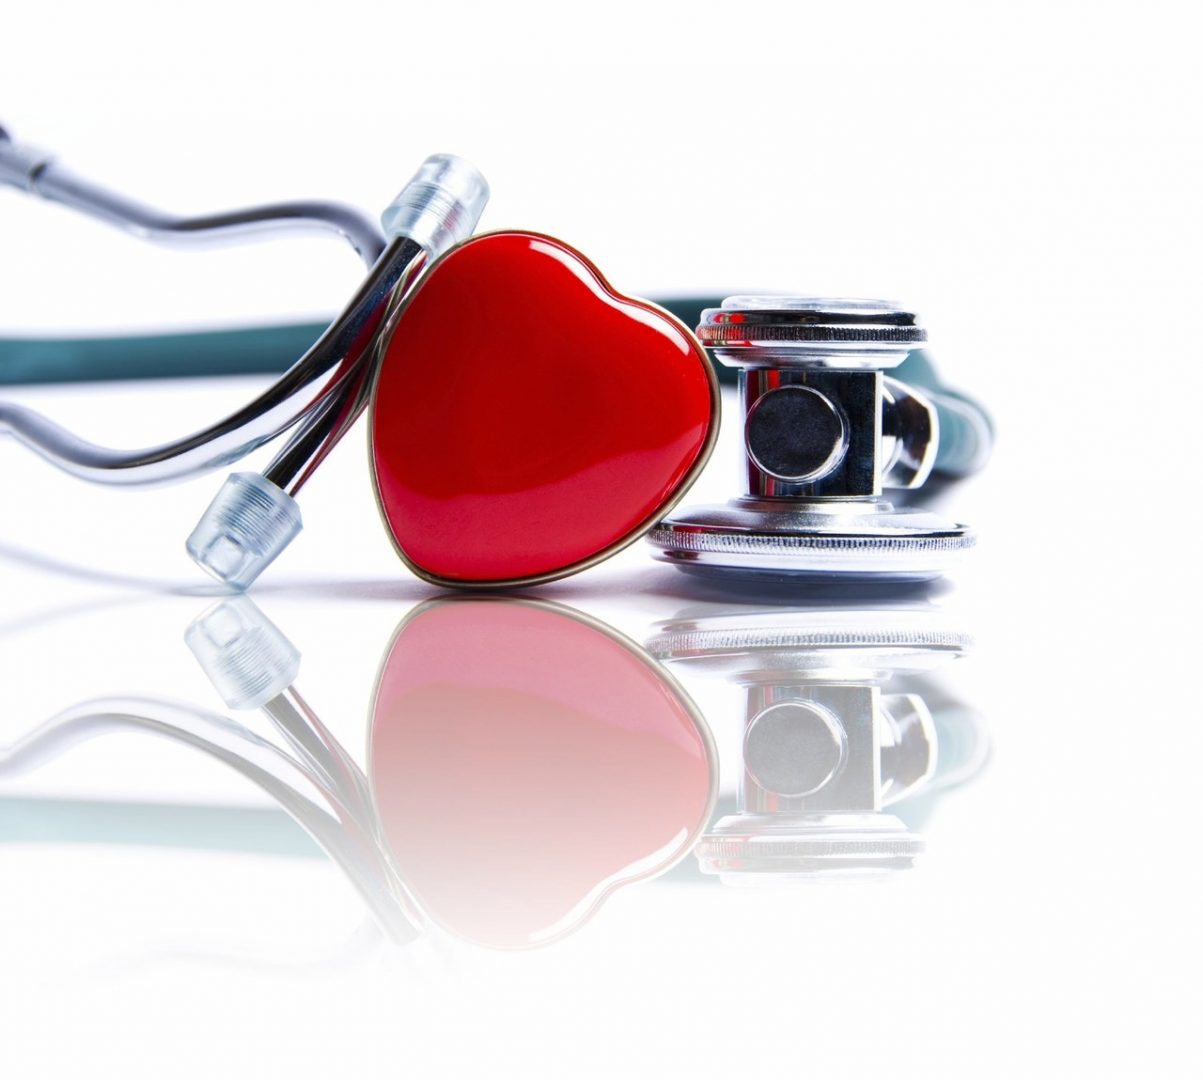 Dobrovoljno Zdravstveno Osiguranje Prirucnik 1